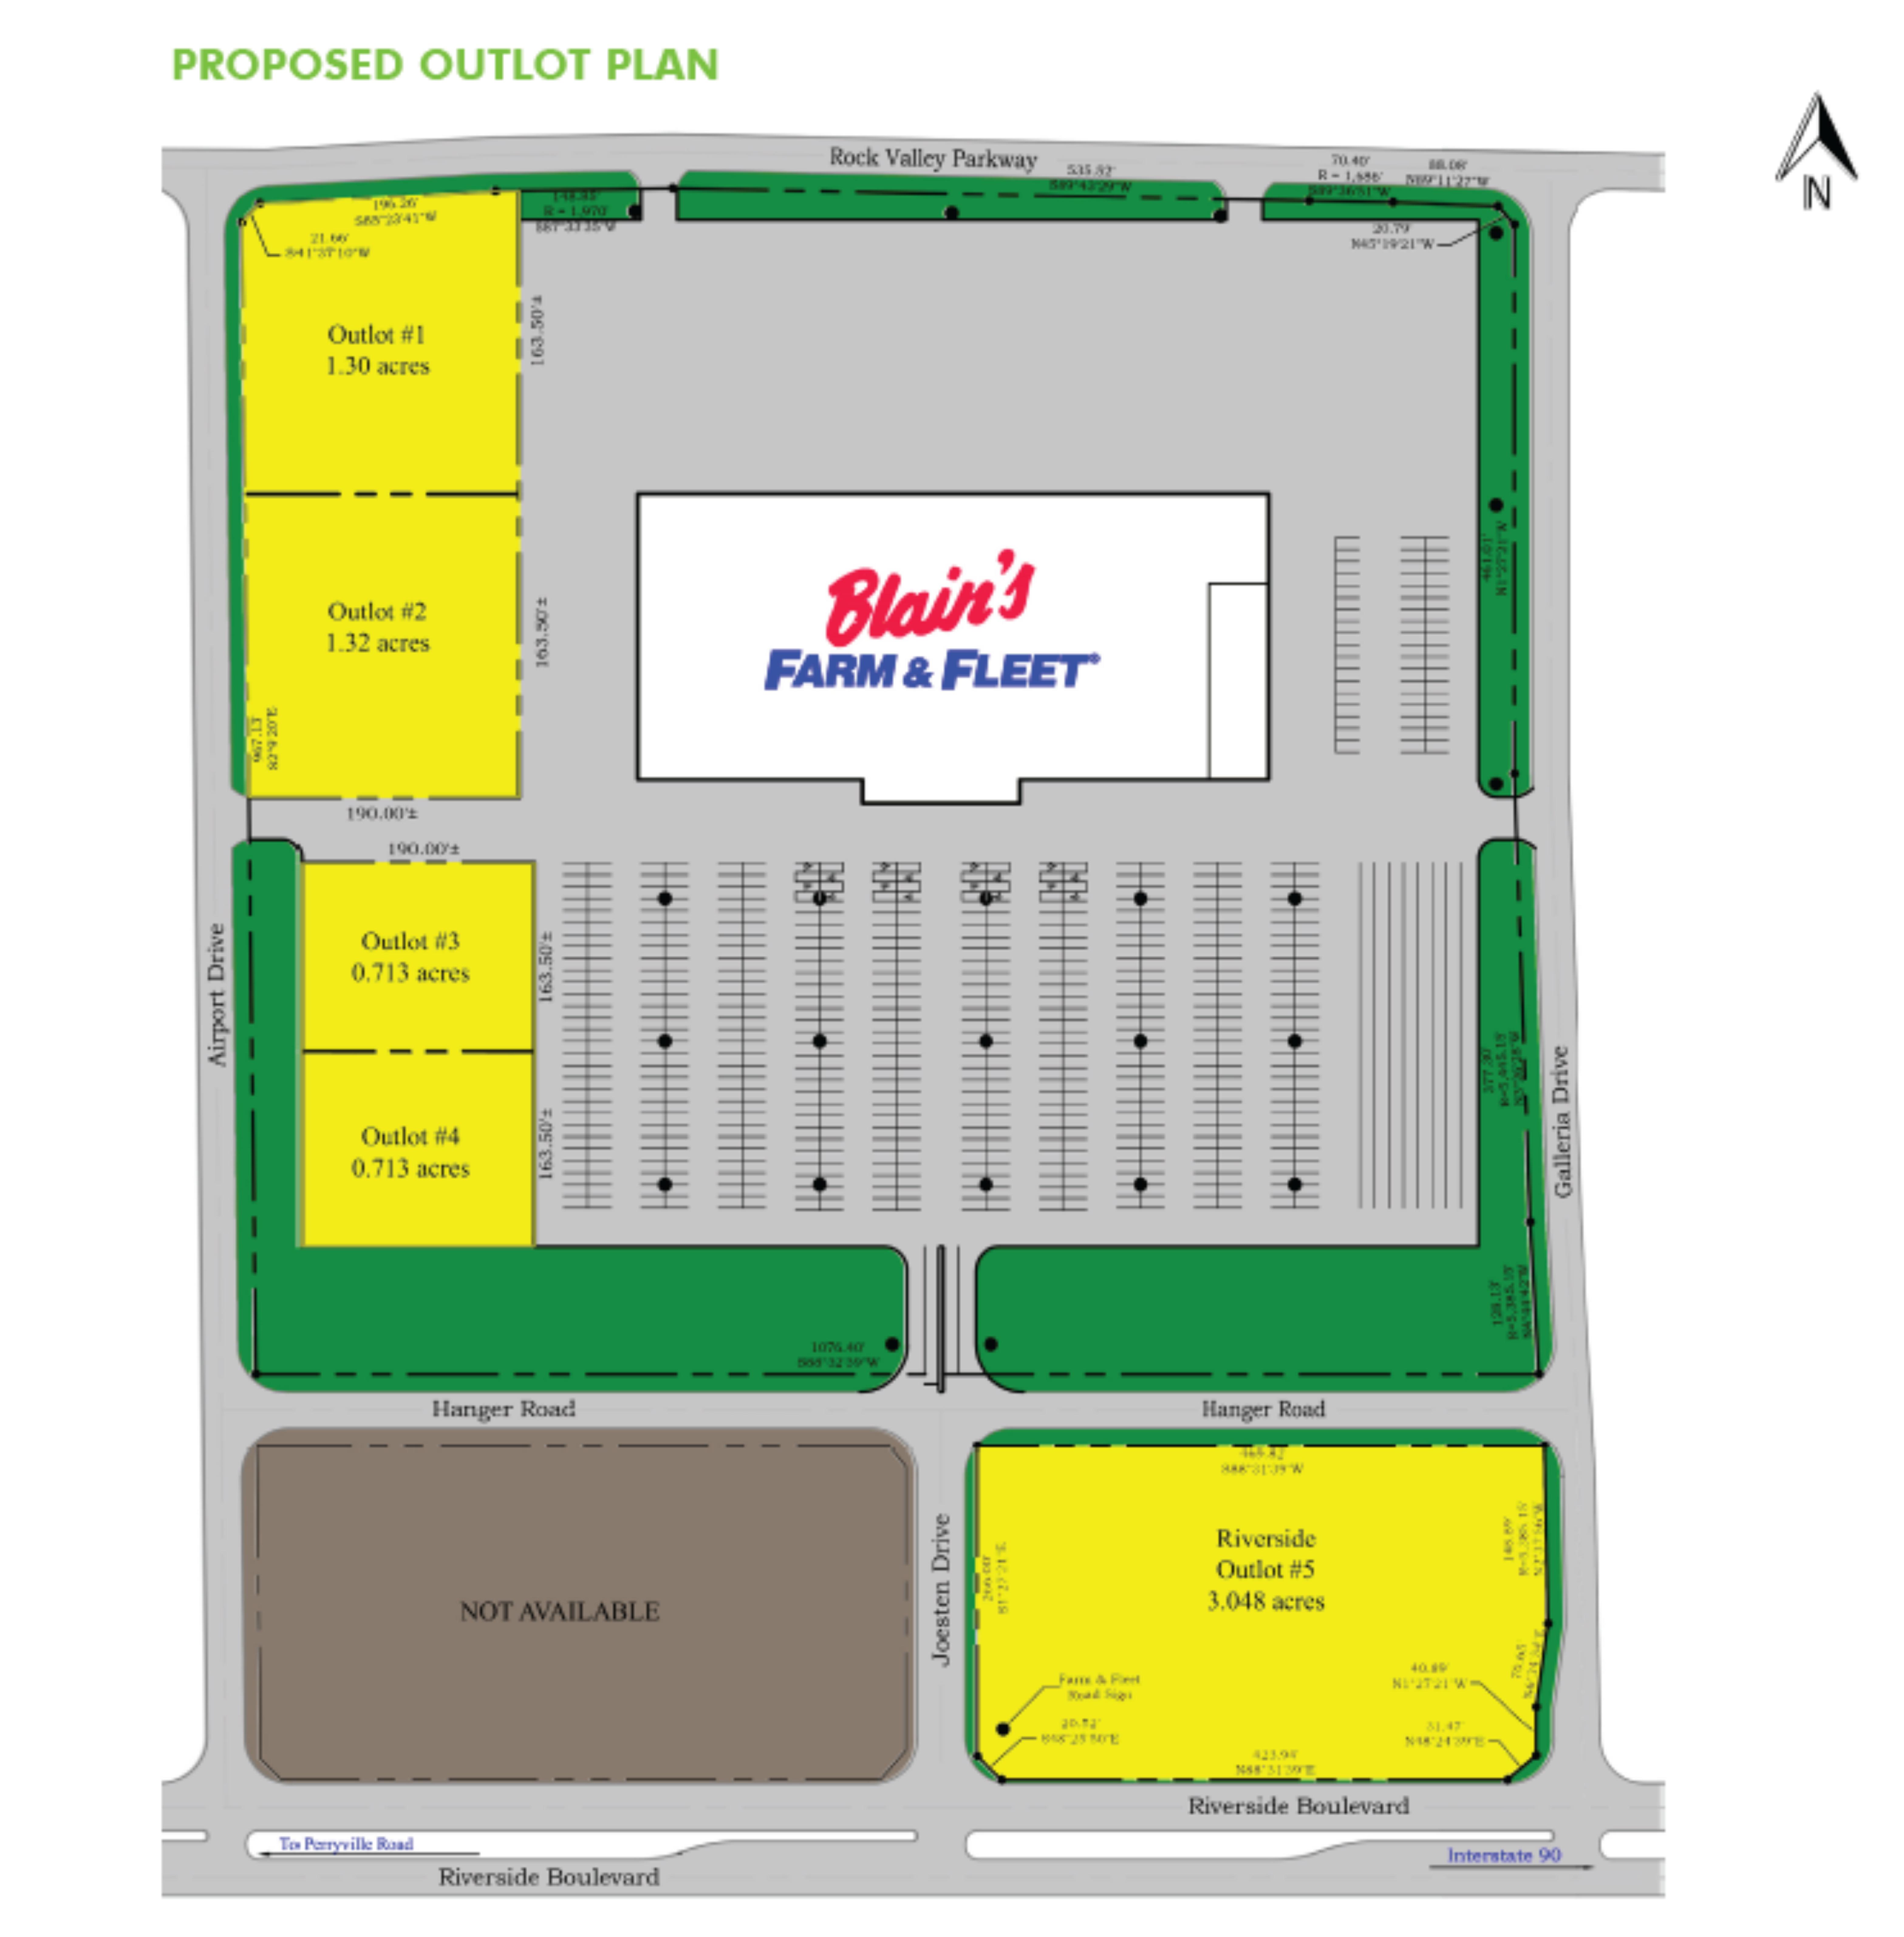 Blain's Farm & Fleet Pad Sites: site plan